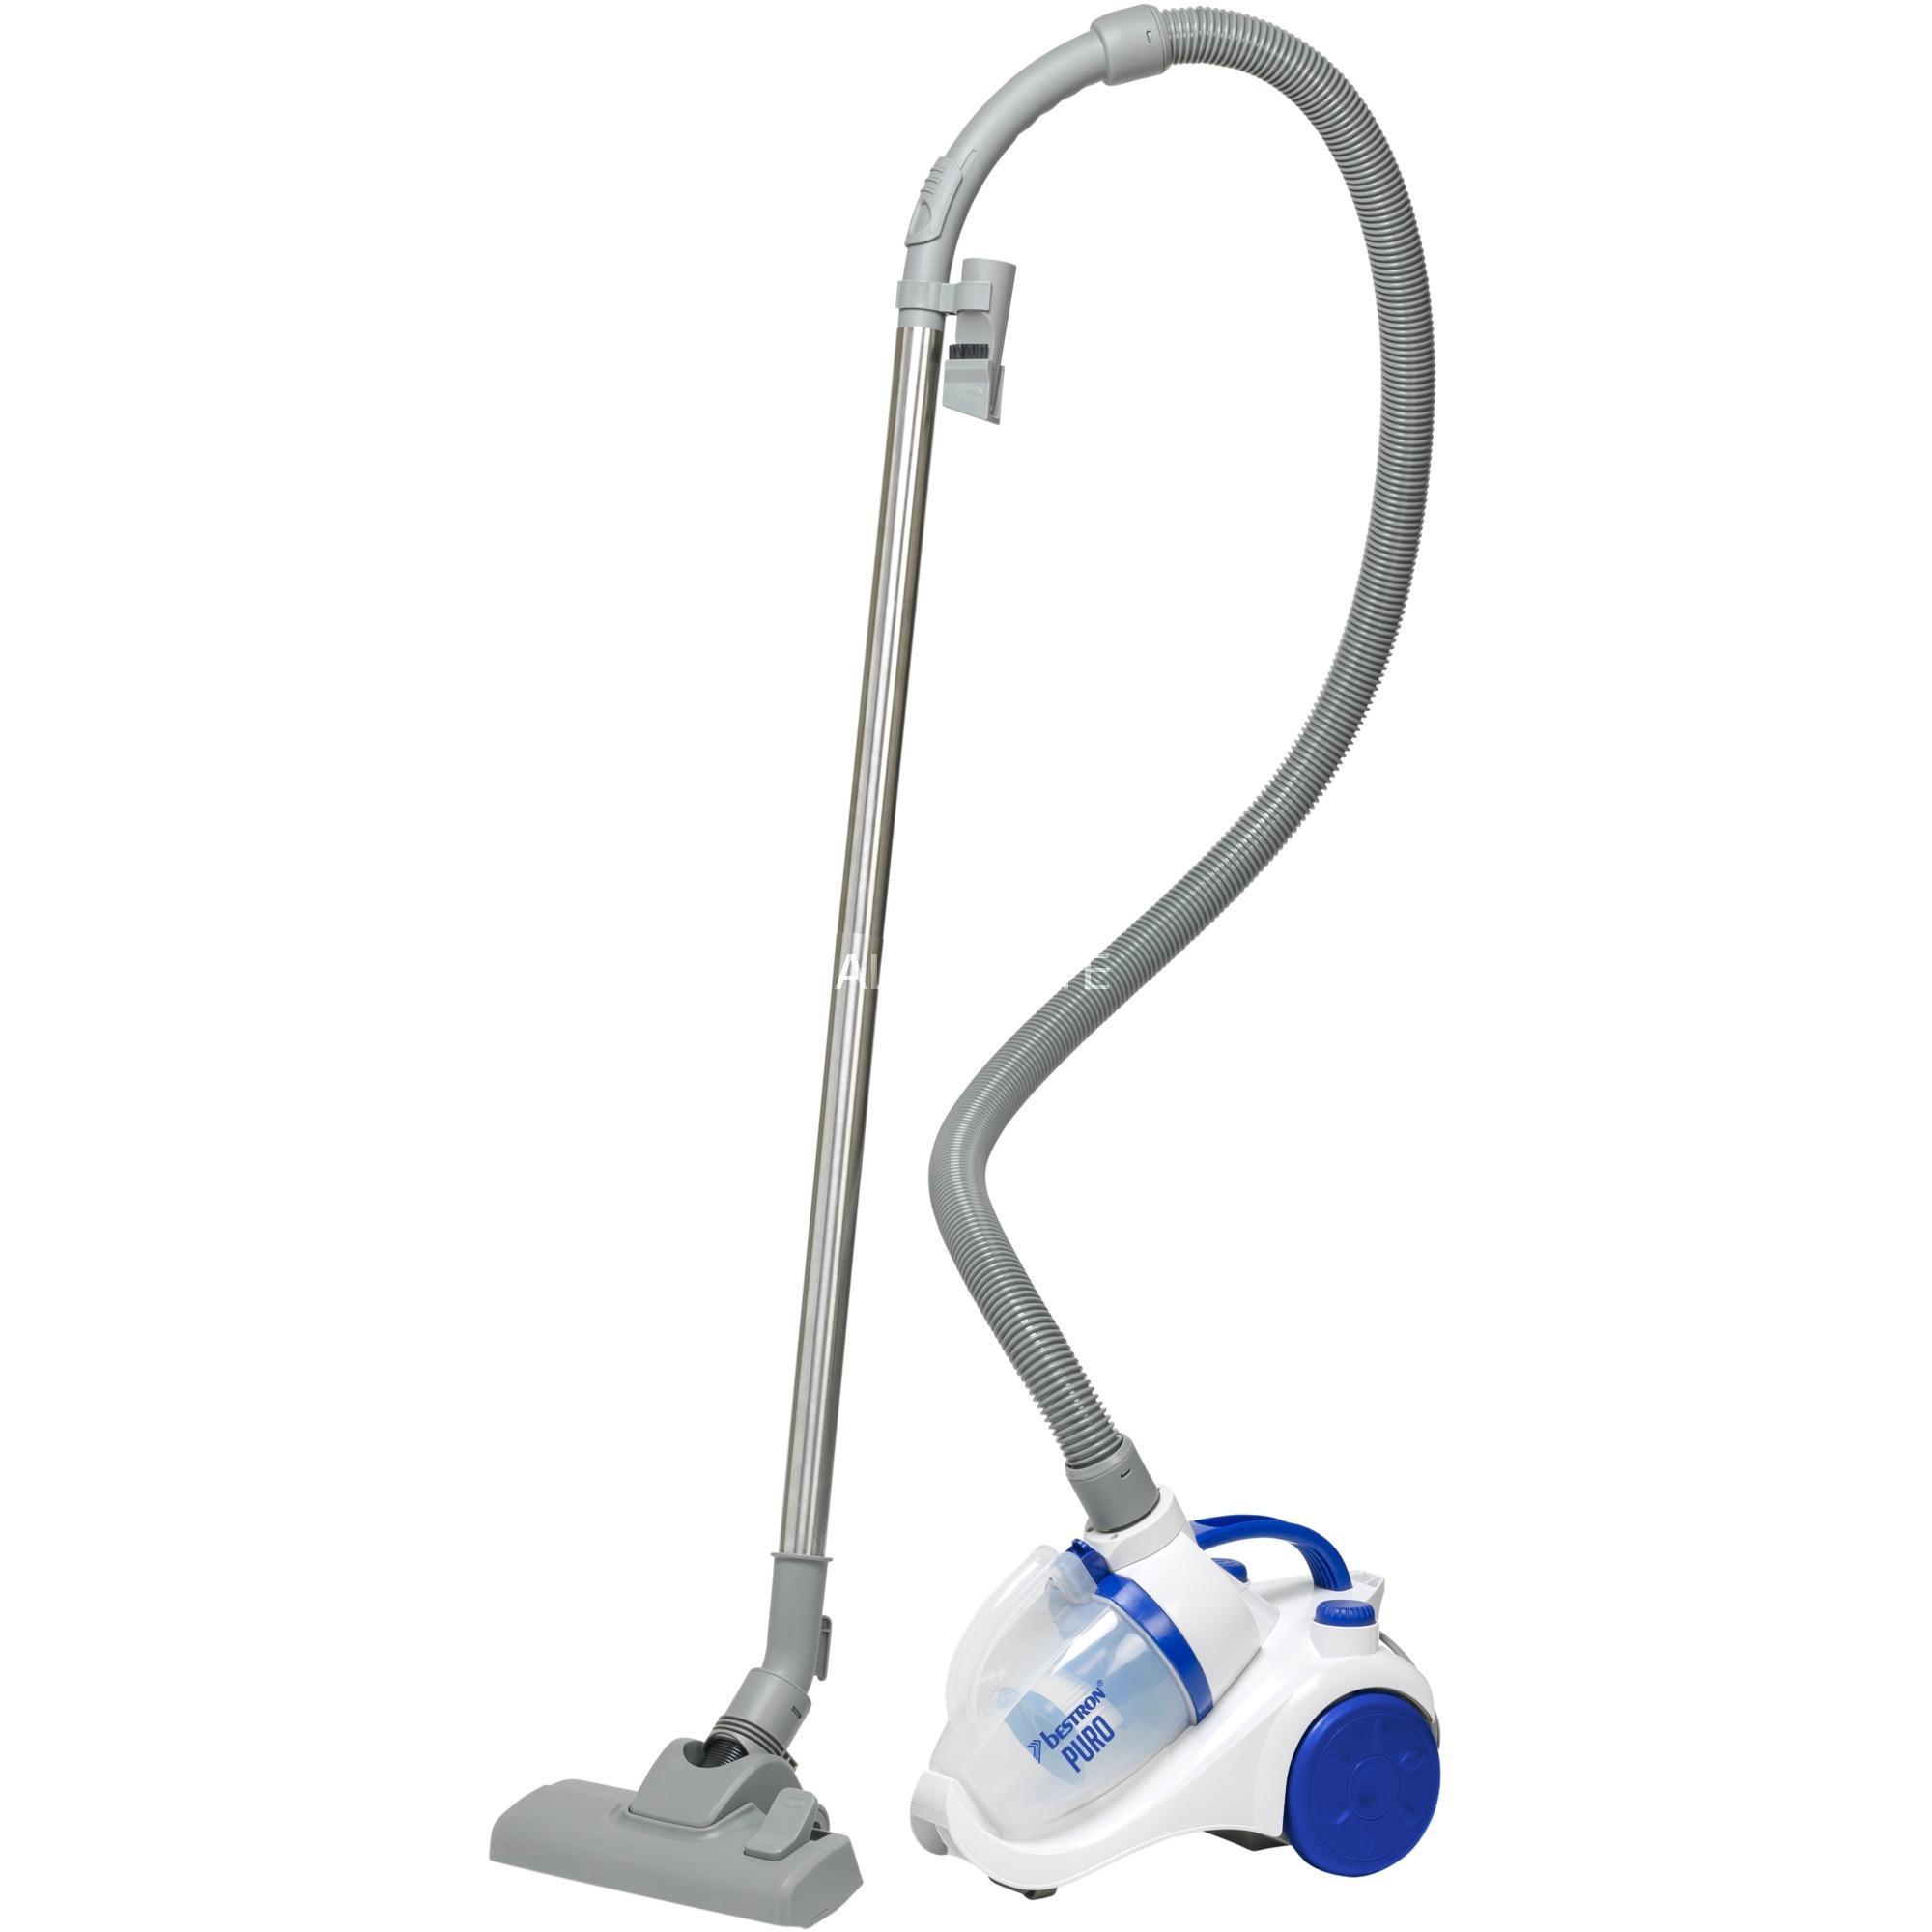 ABL830WB aspiradora 700 W Aspiradora cilíndrica 1 L Azul, Blanco, Aspiradora de suelo